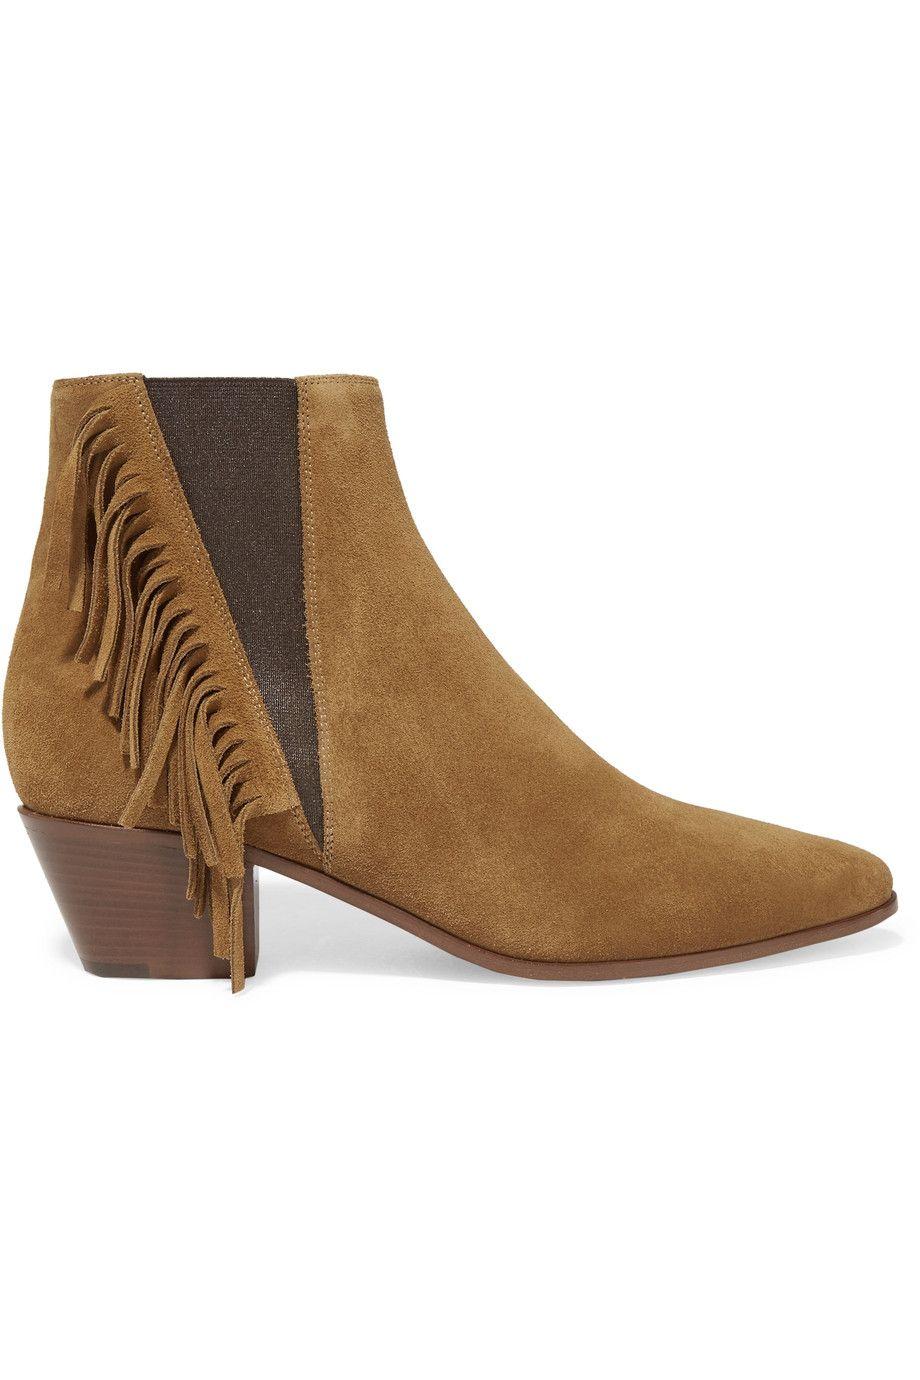 73e80703aa5 SAINT LAURENT Fringed Suede Ankle Boots. #saintlaurent #shoes #boots ...